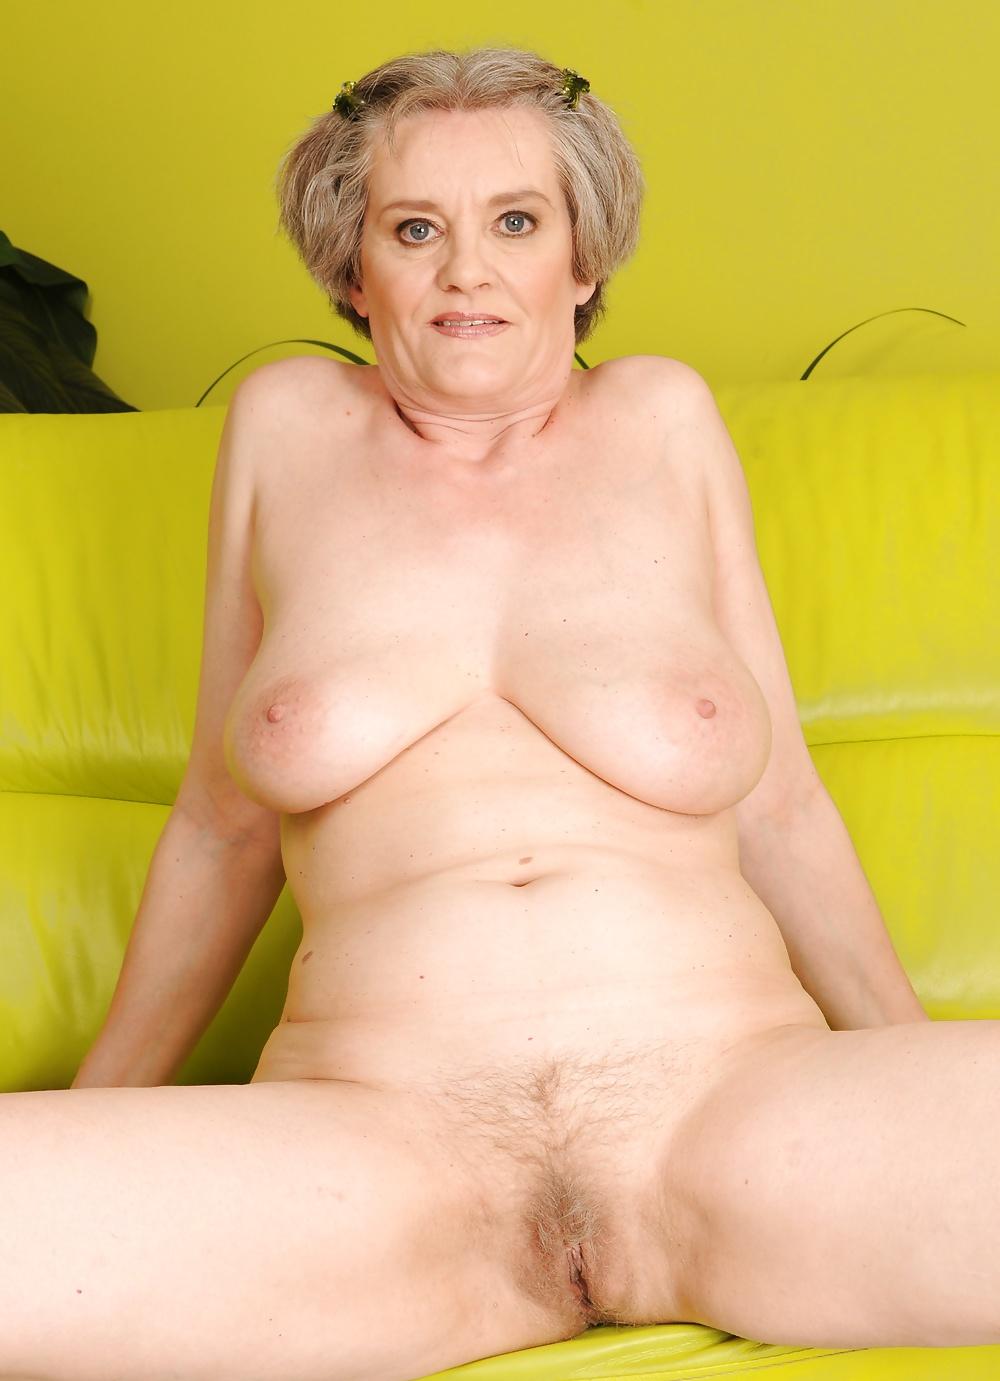 Granny hardcore sex pictures